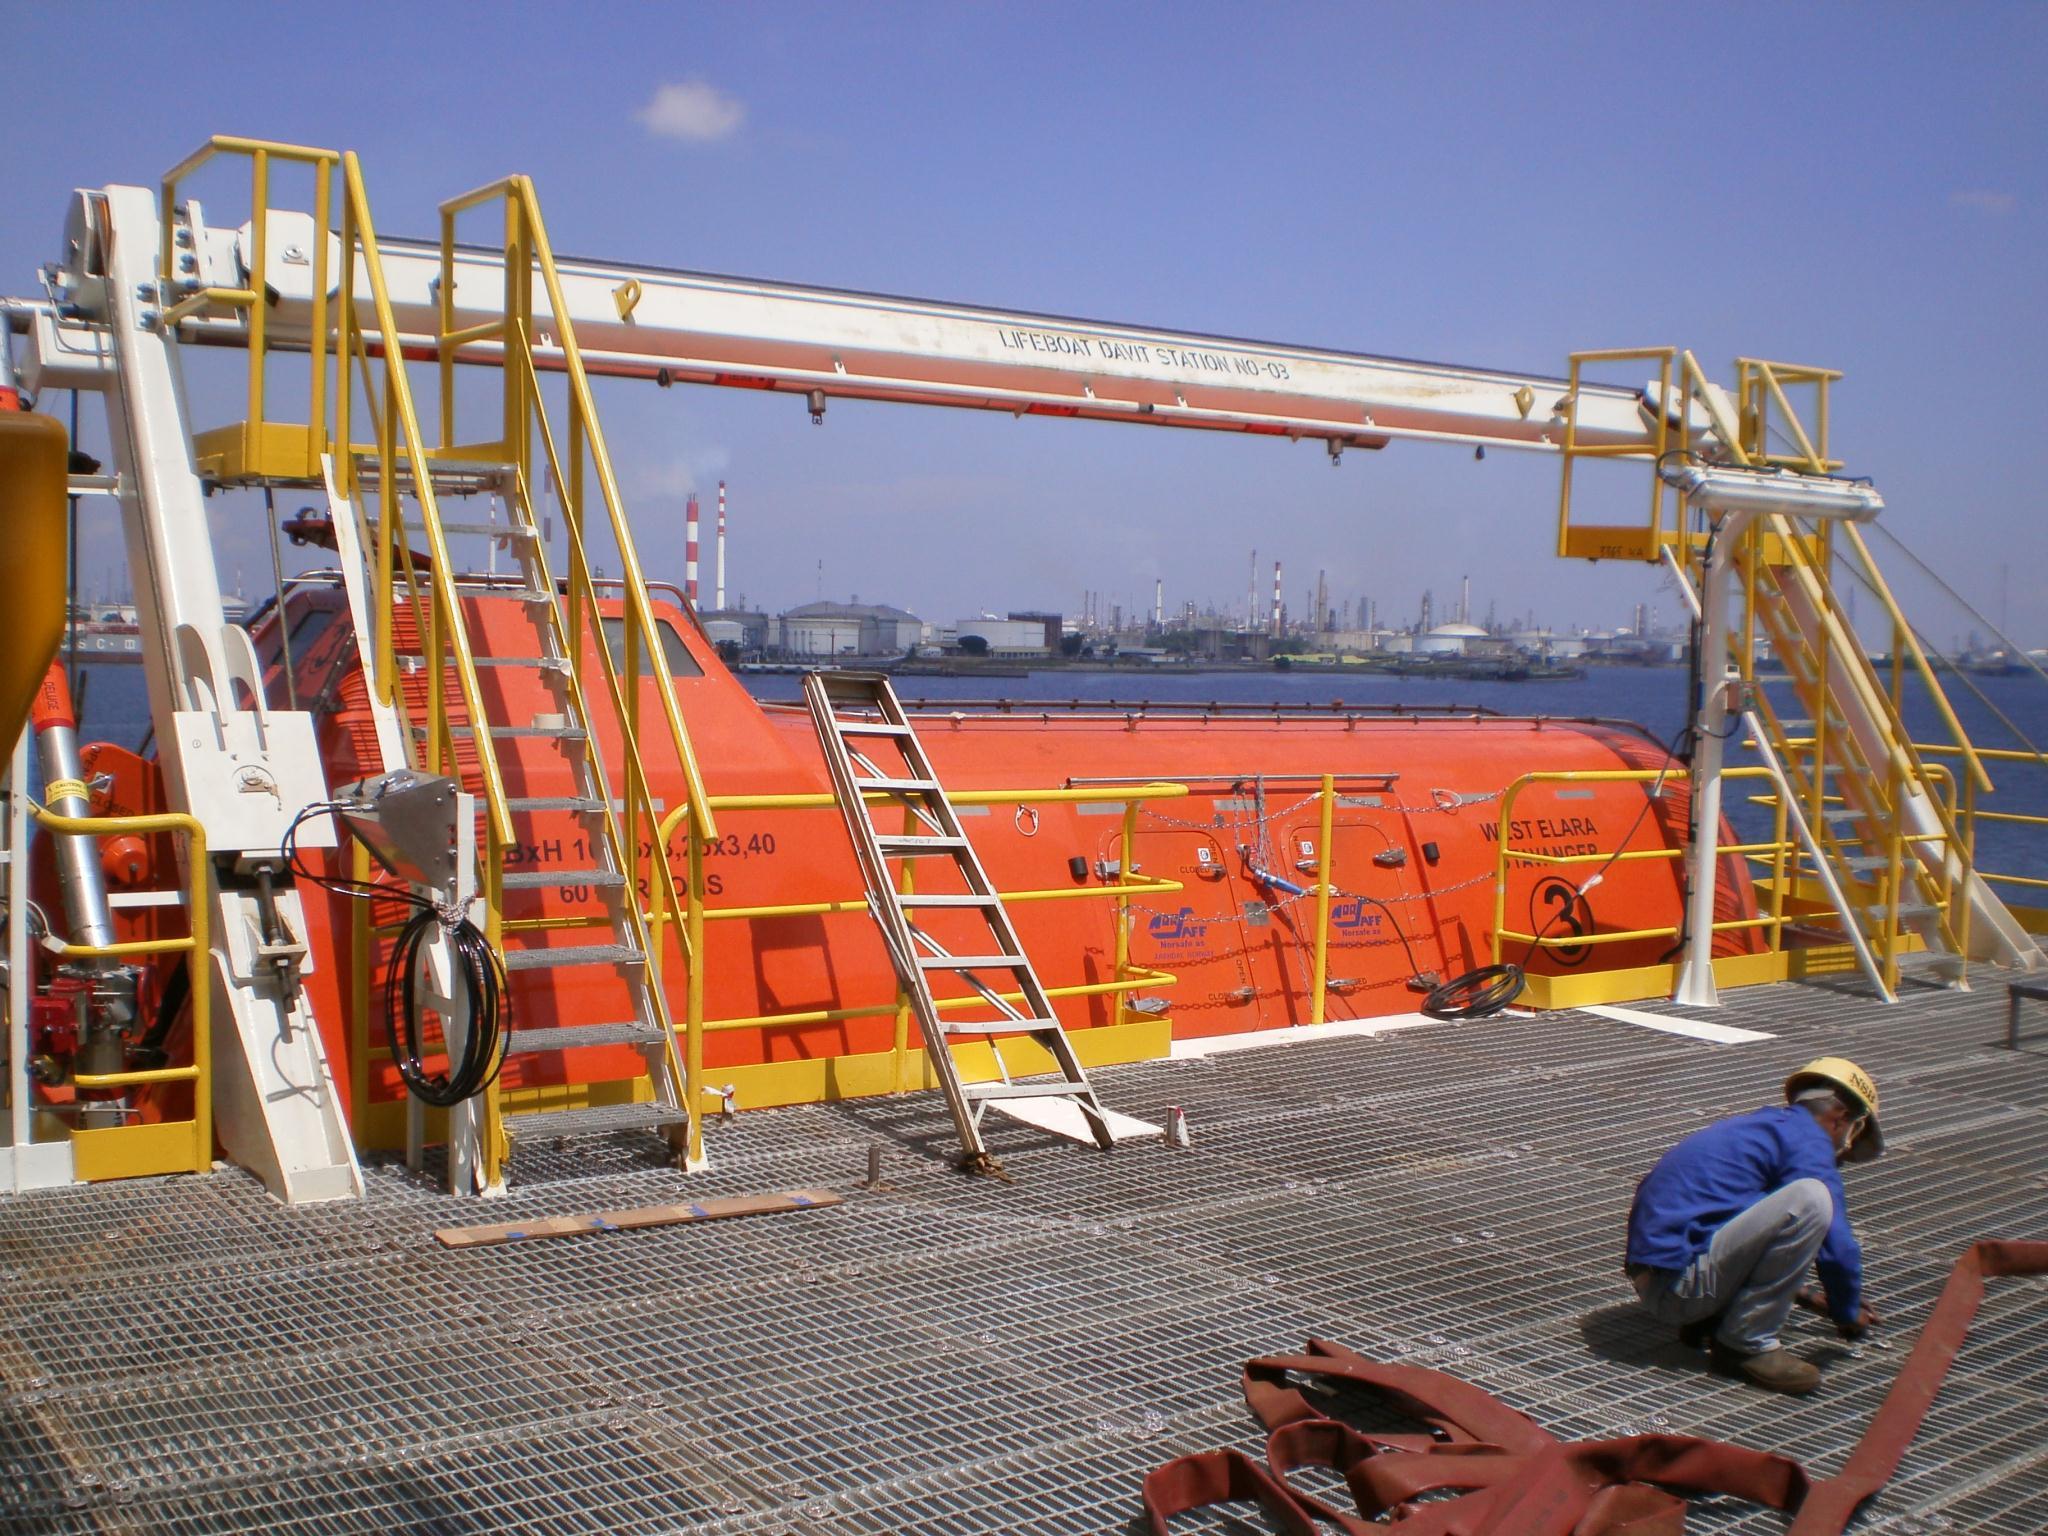 Norsafe lifeboat